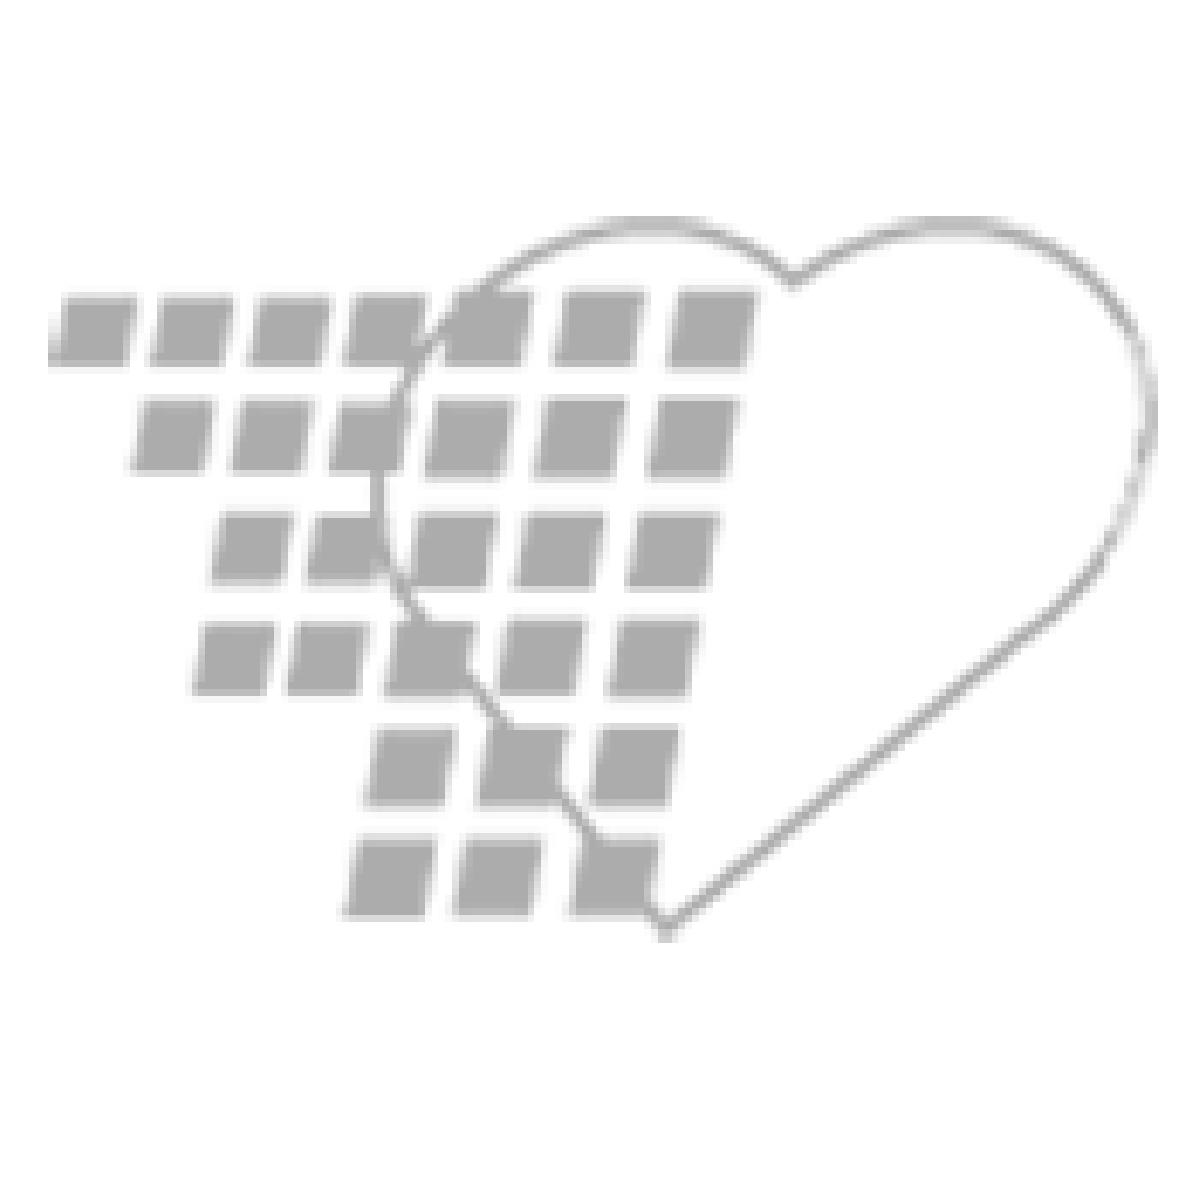 04-37-1610 - Omnicell® Half Height Plus Savy® Custom Unit